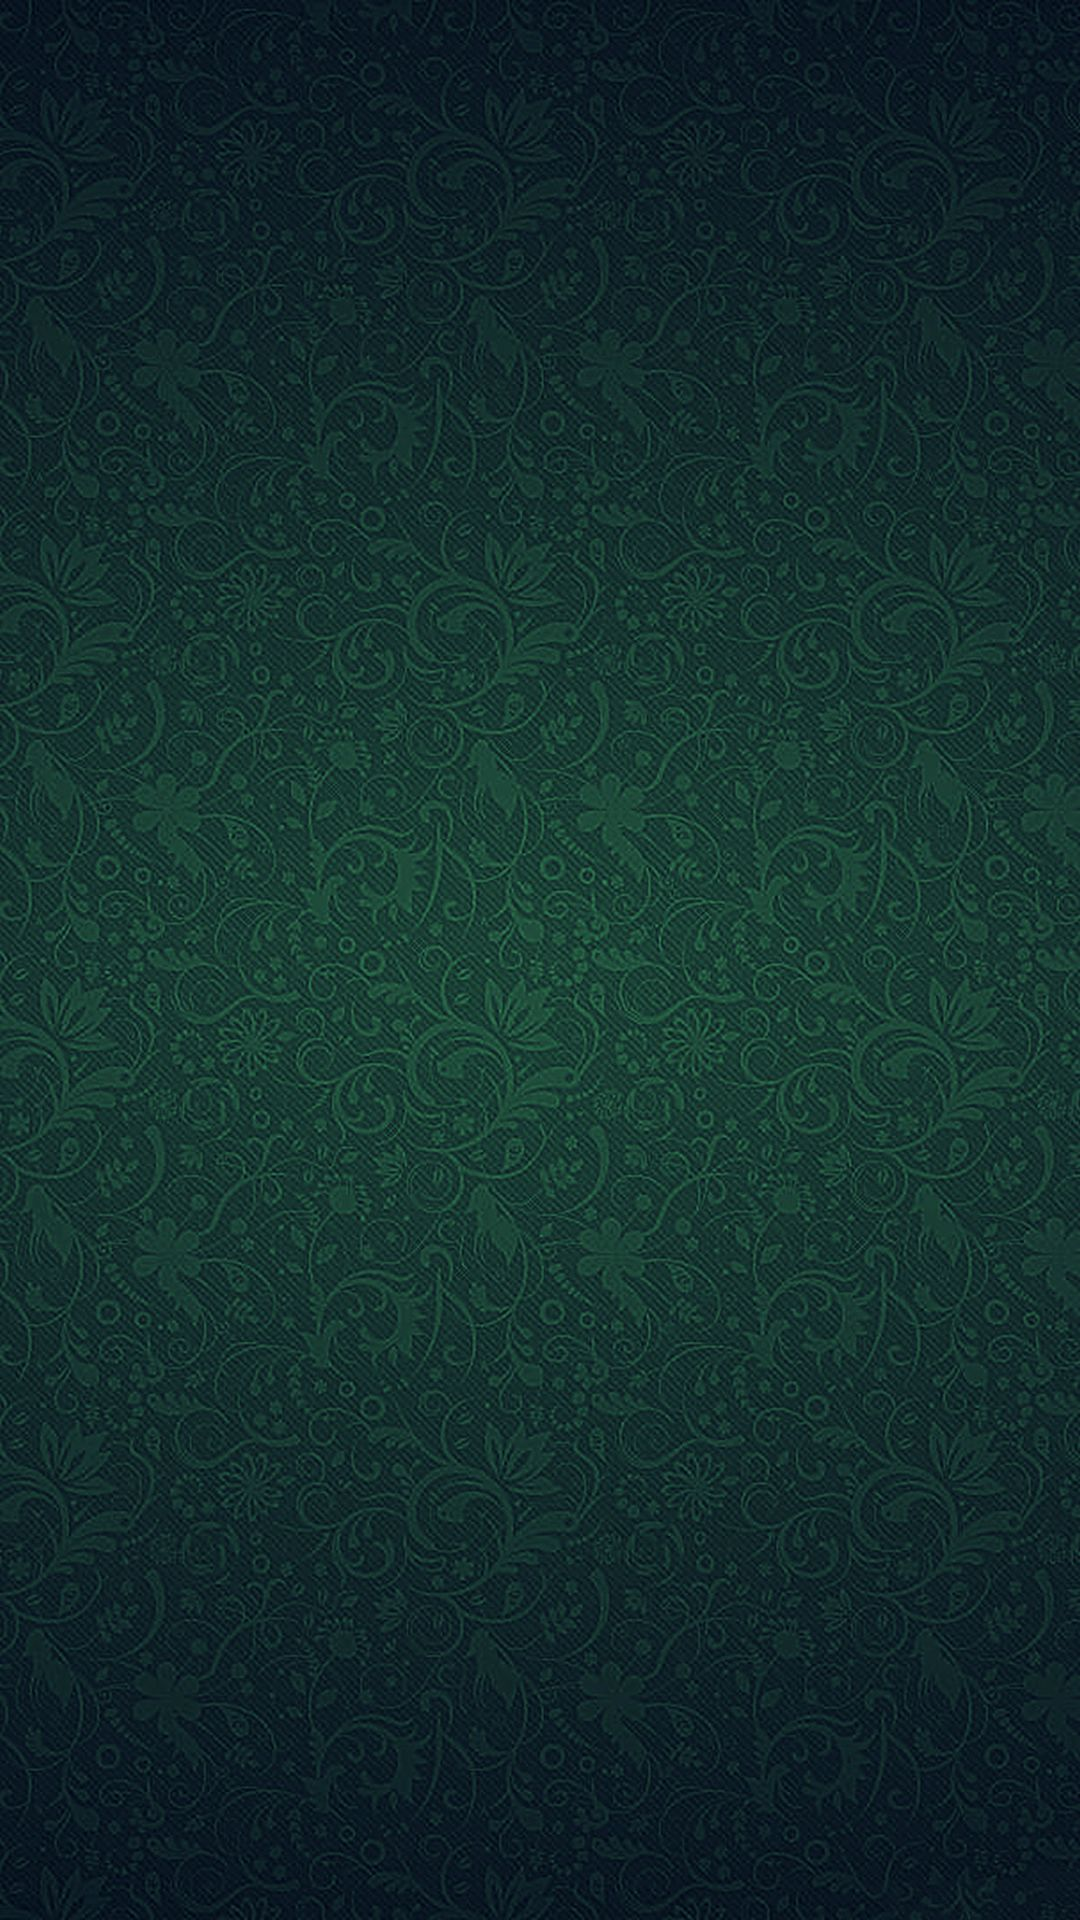 Green Ornament Texture Pattern iPhone 7 wallpaper